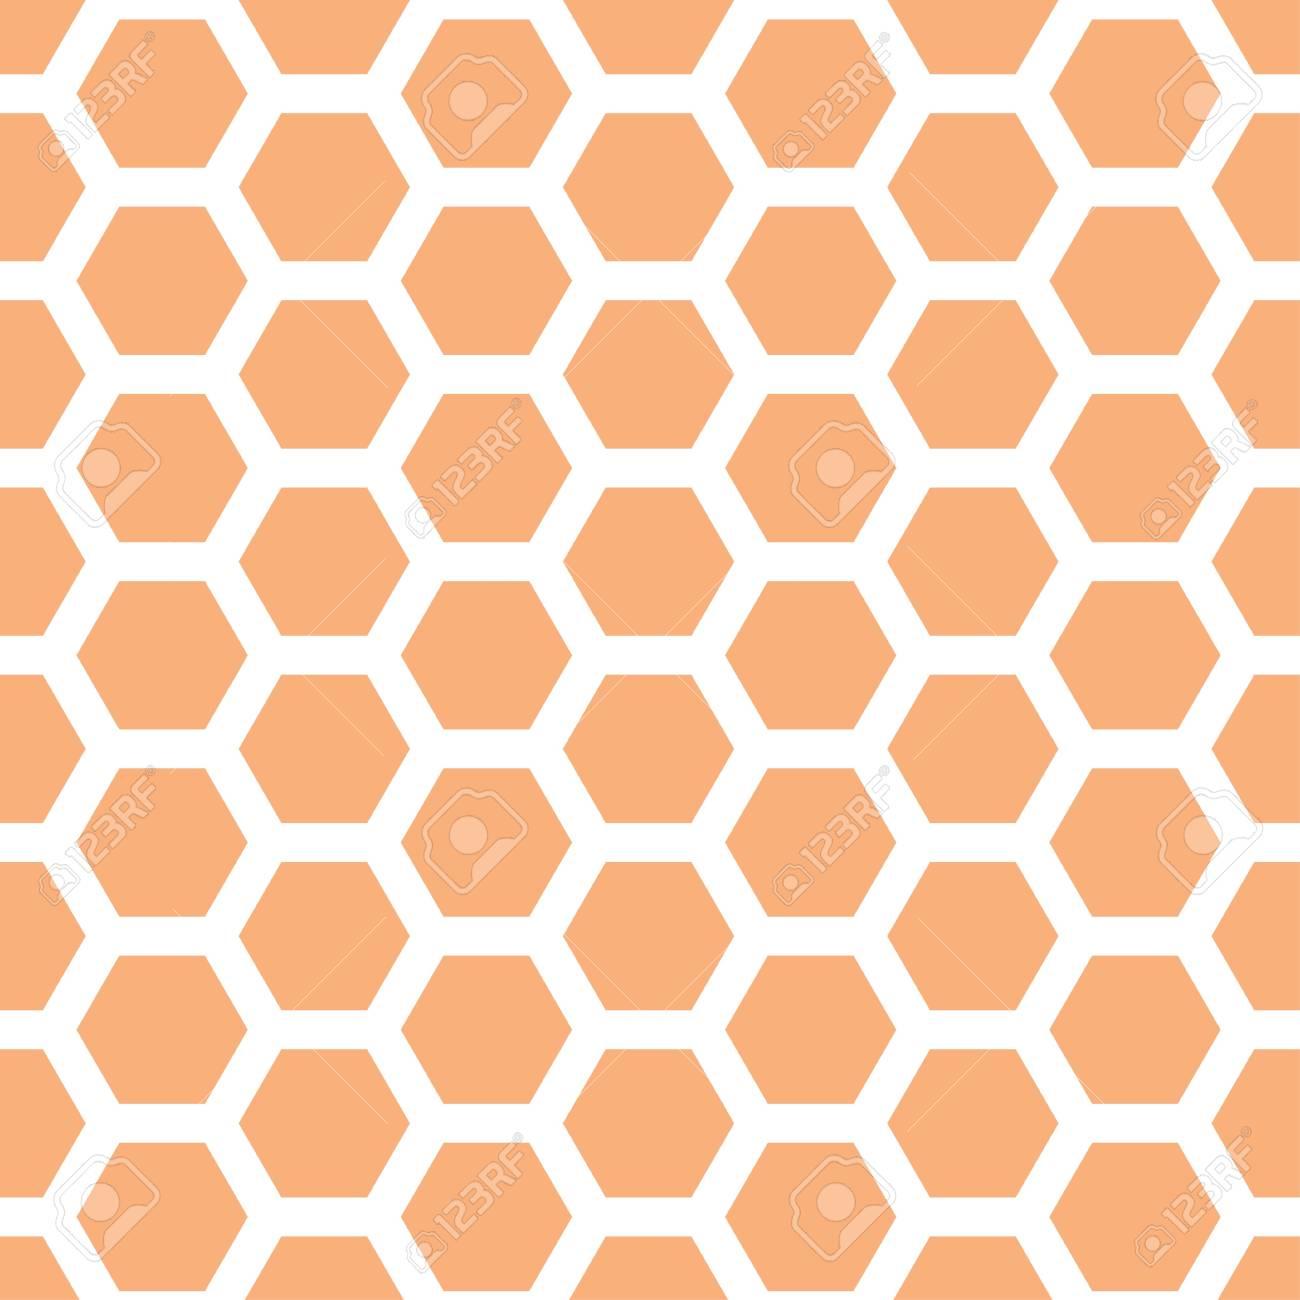 Seamless geometric pattern with honeycombs - 114708521